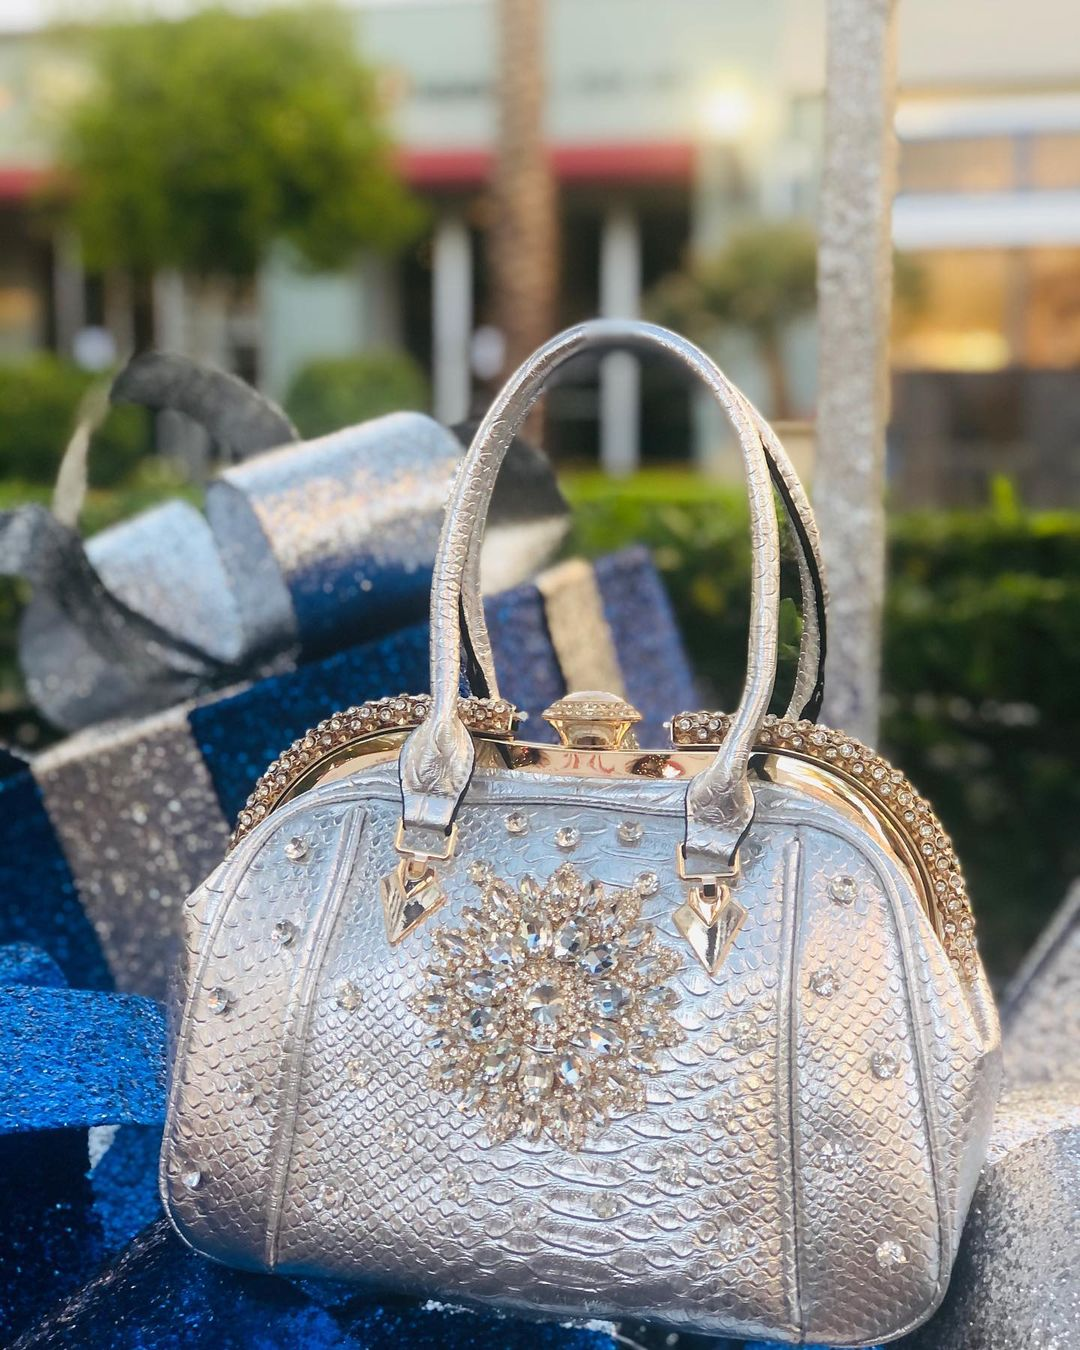 Silver Handbag with Gold Rhinestones in Flower Pattern